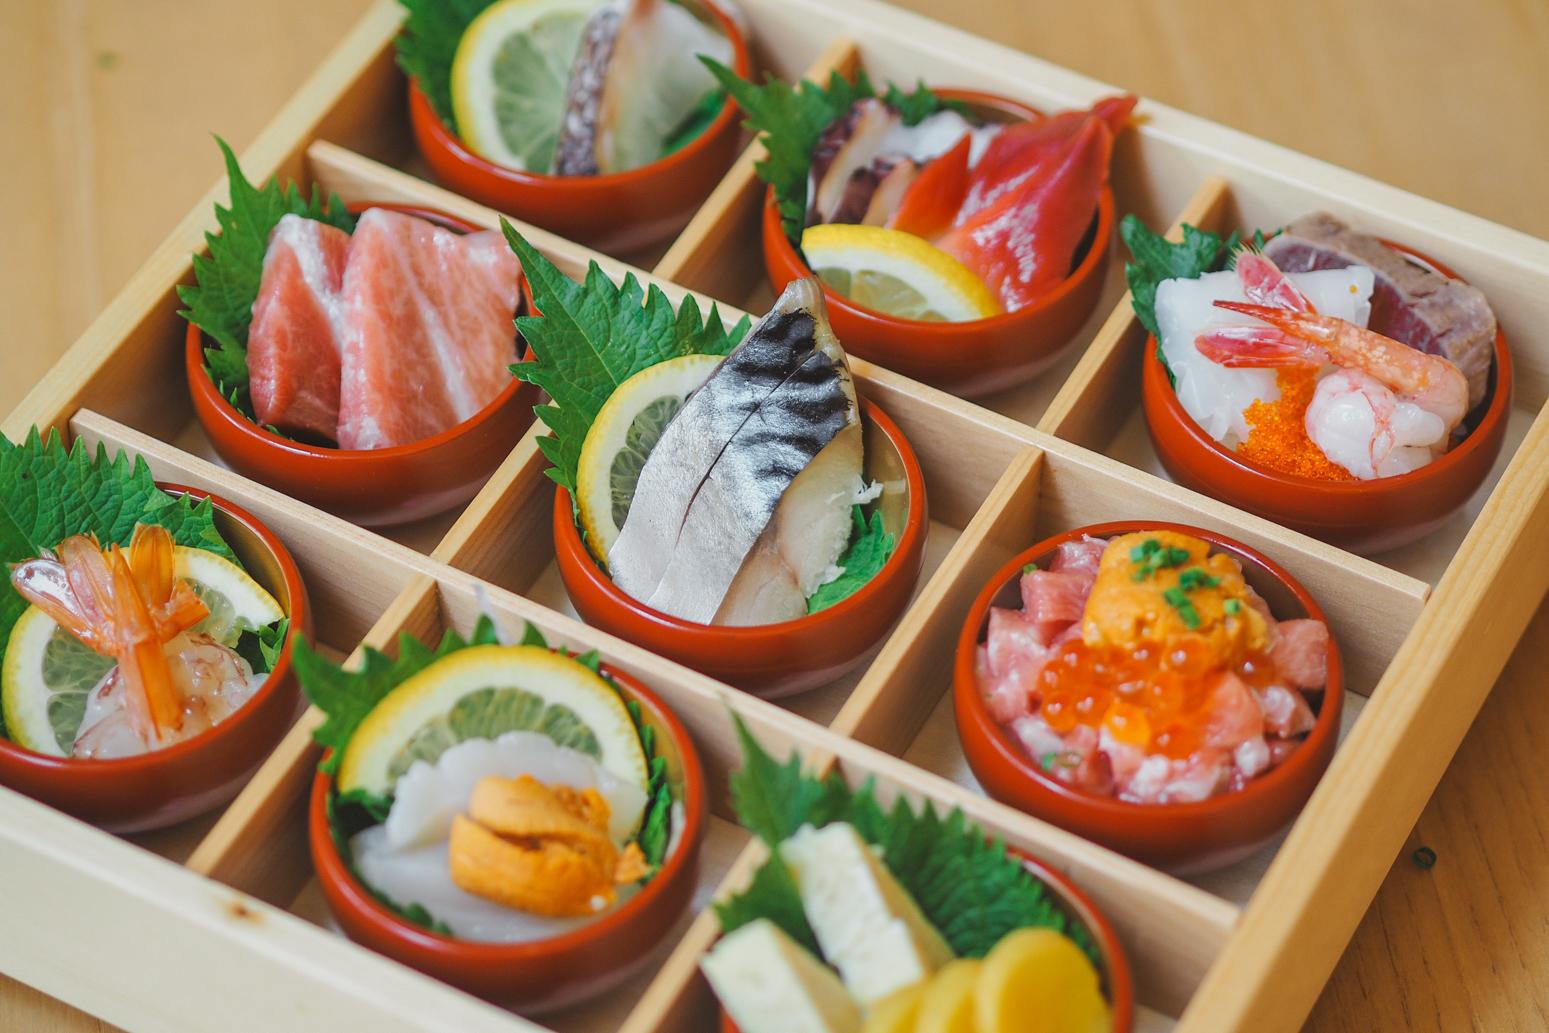 sushi hiro senopati eatandtreats indonesian food and. Black Bedroom Furniture Sets. Home Design Ideas